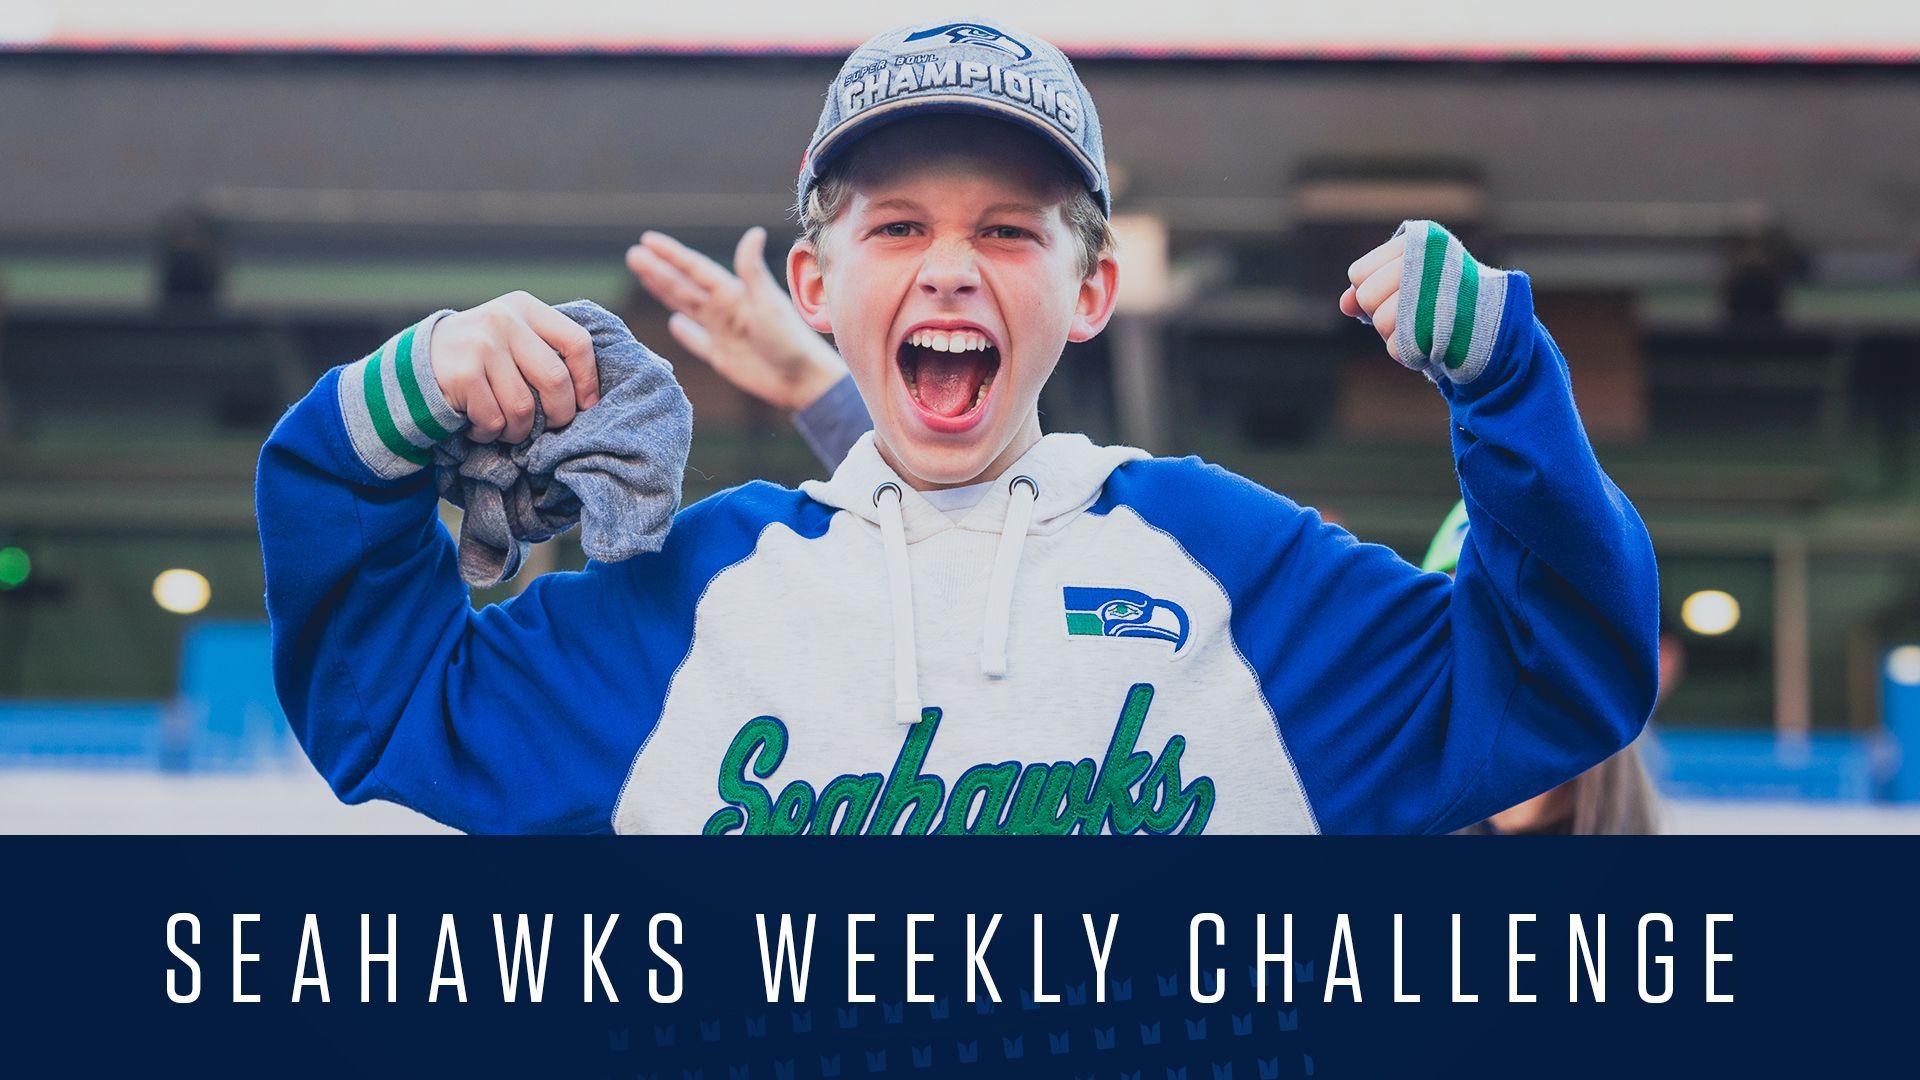 Seahawks Weekly Challenge